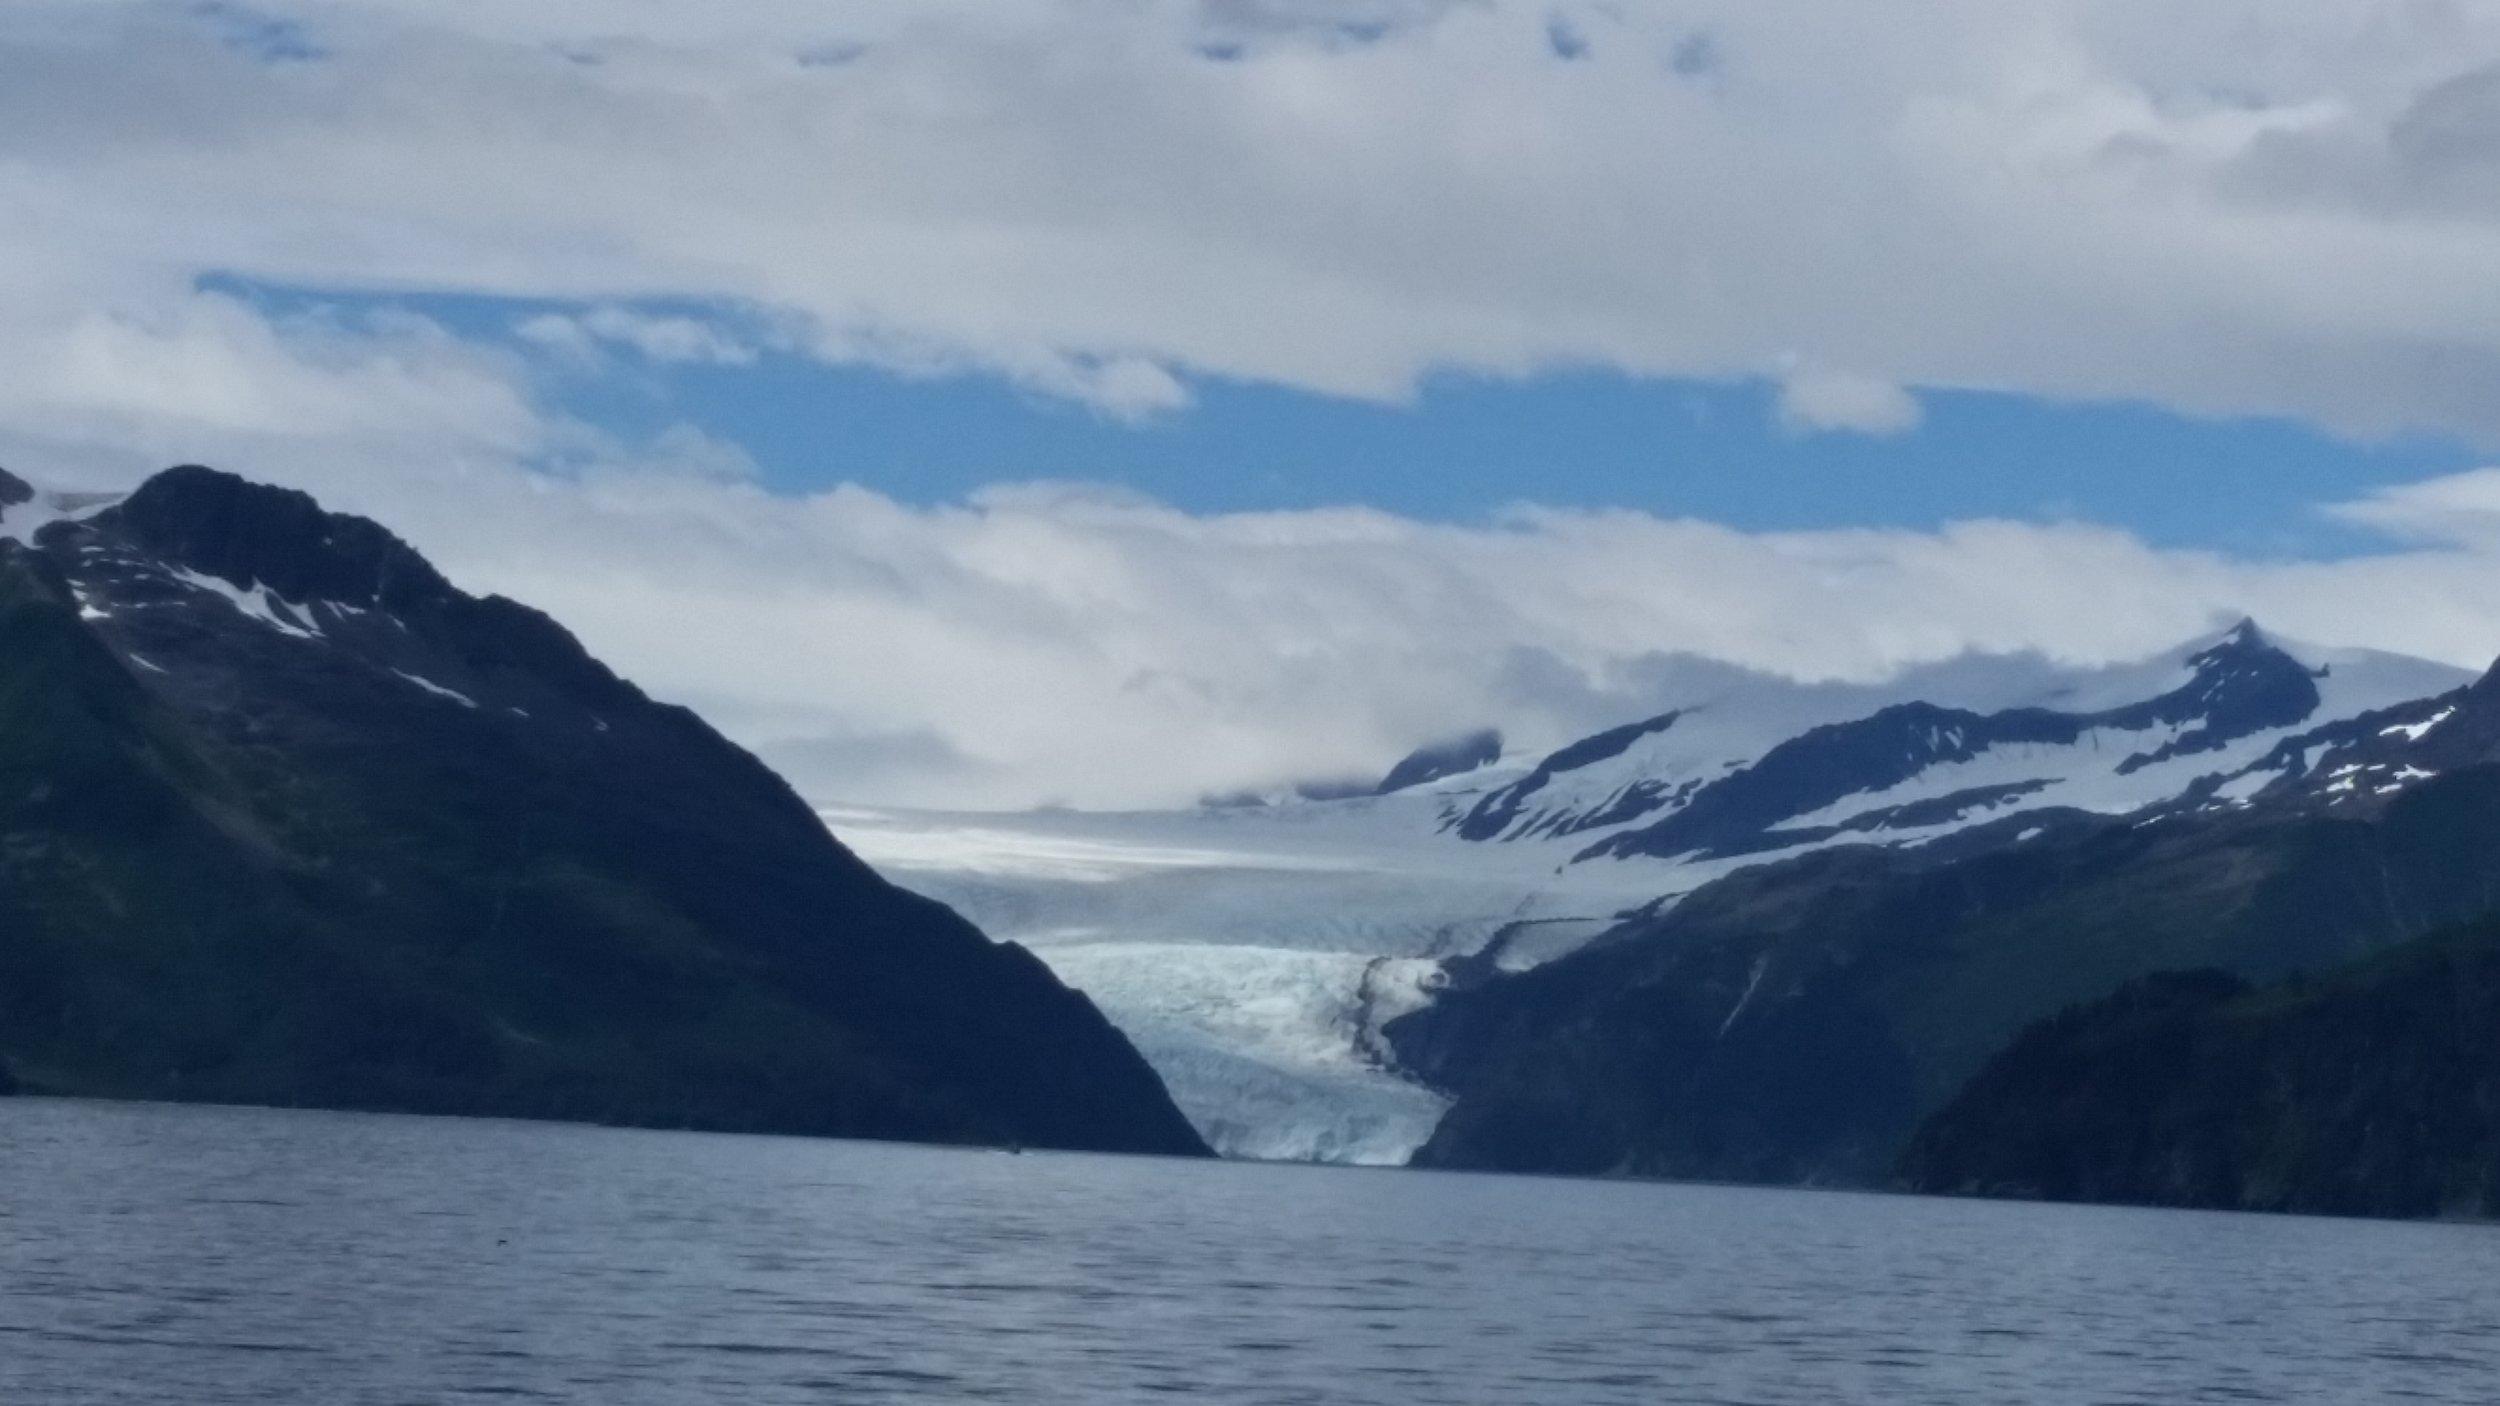 Glacier/wildlife day cruise out of seward